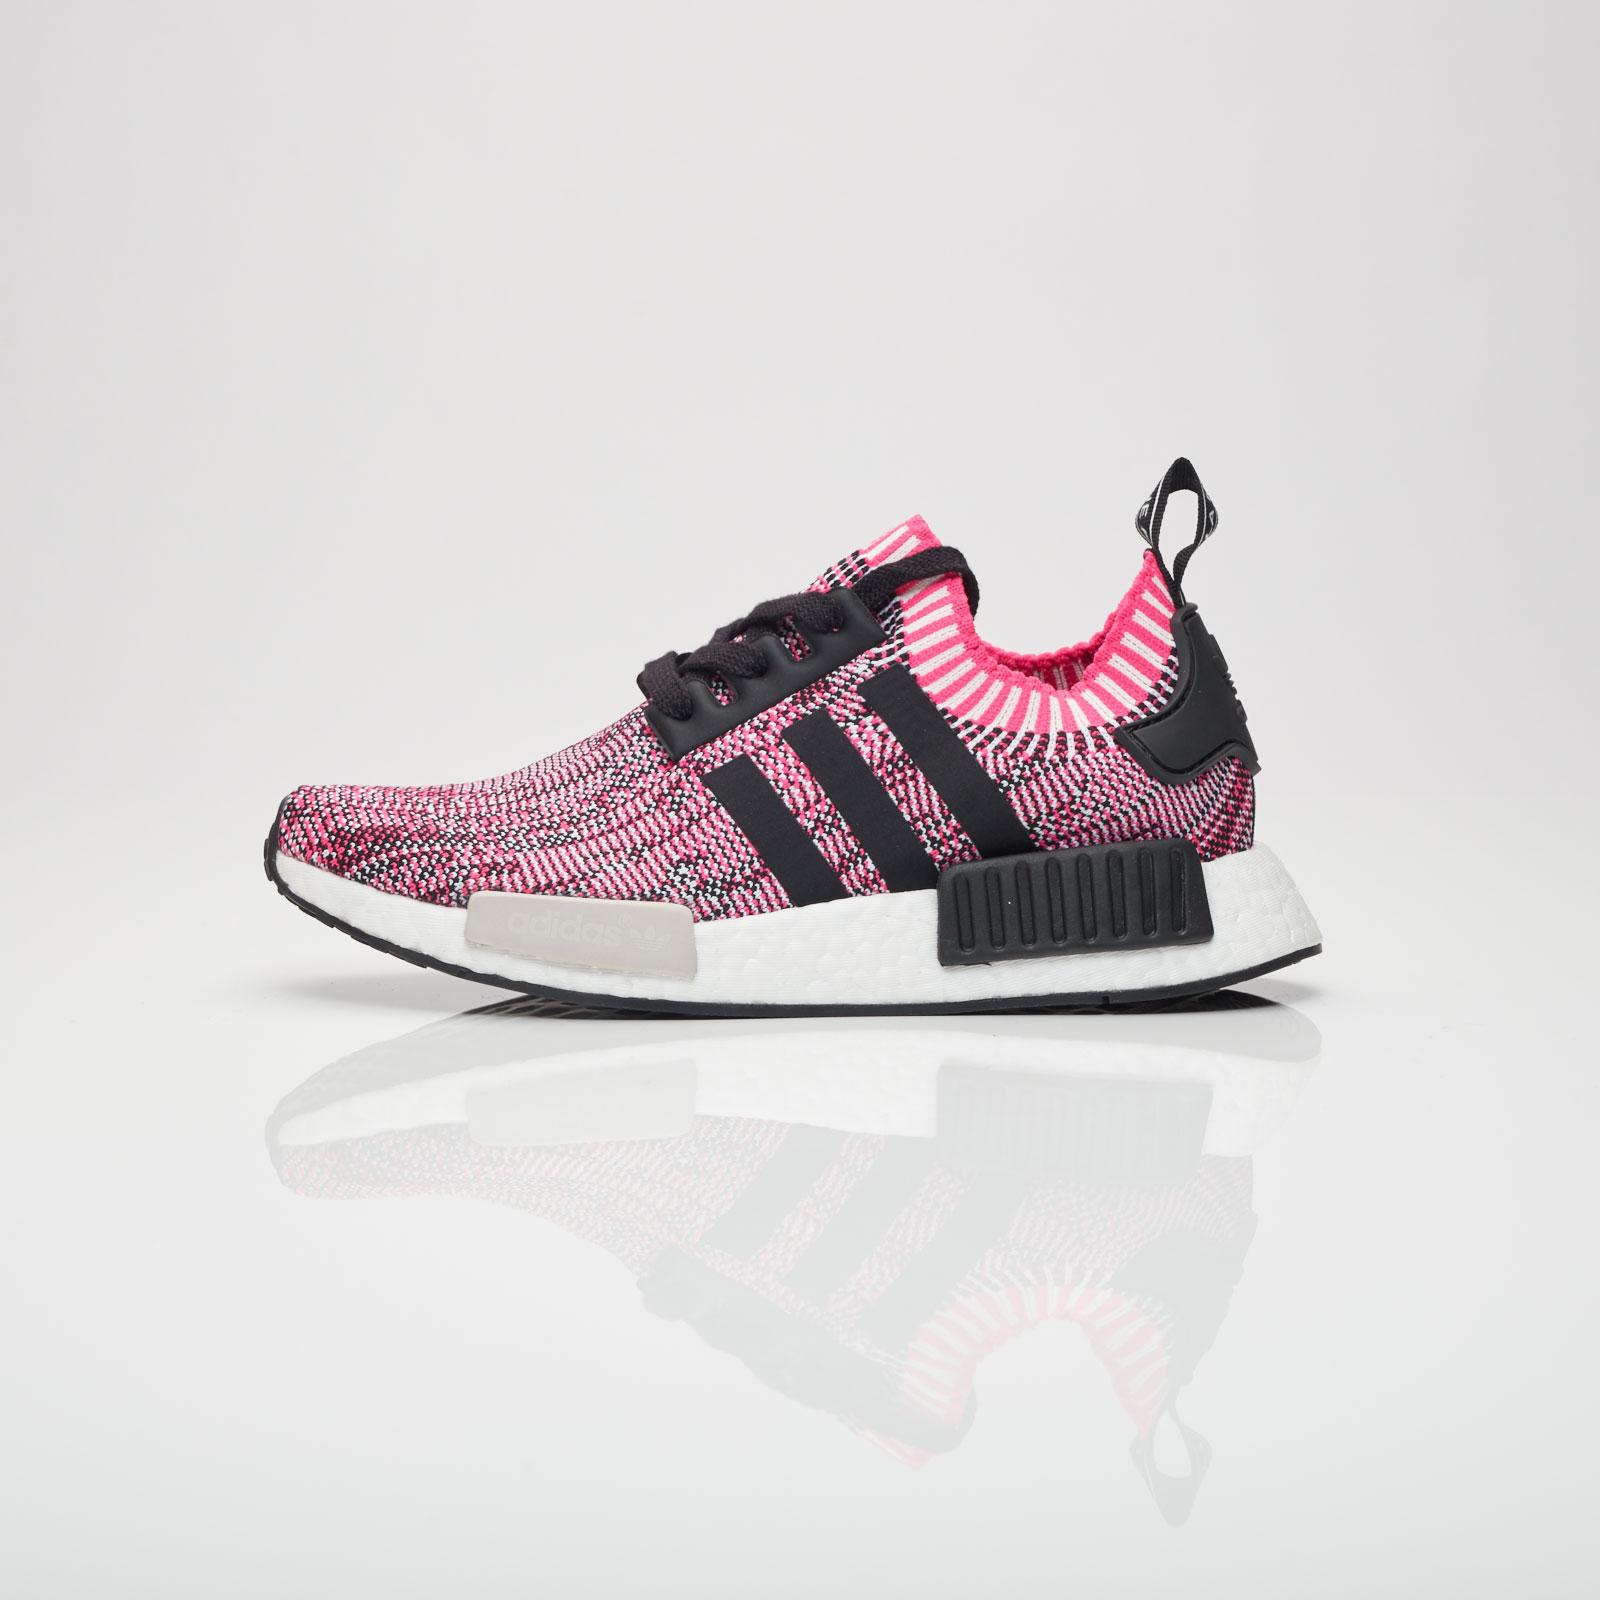 7616dc1343b8a adidas Nmd R1 W Pk - Bb2363 - Sneakersnstuff